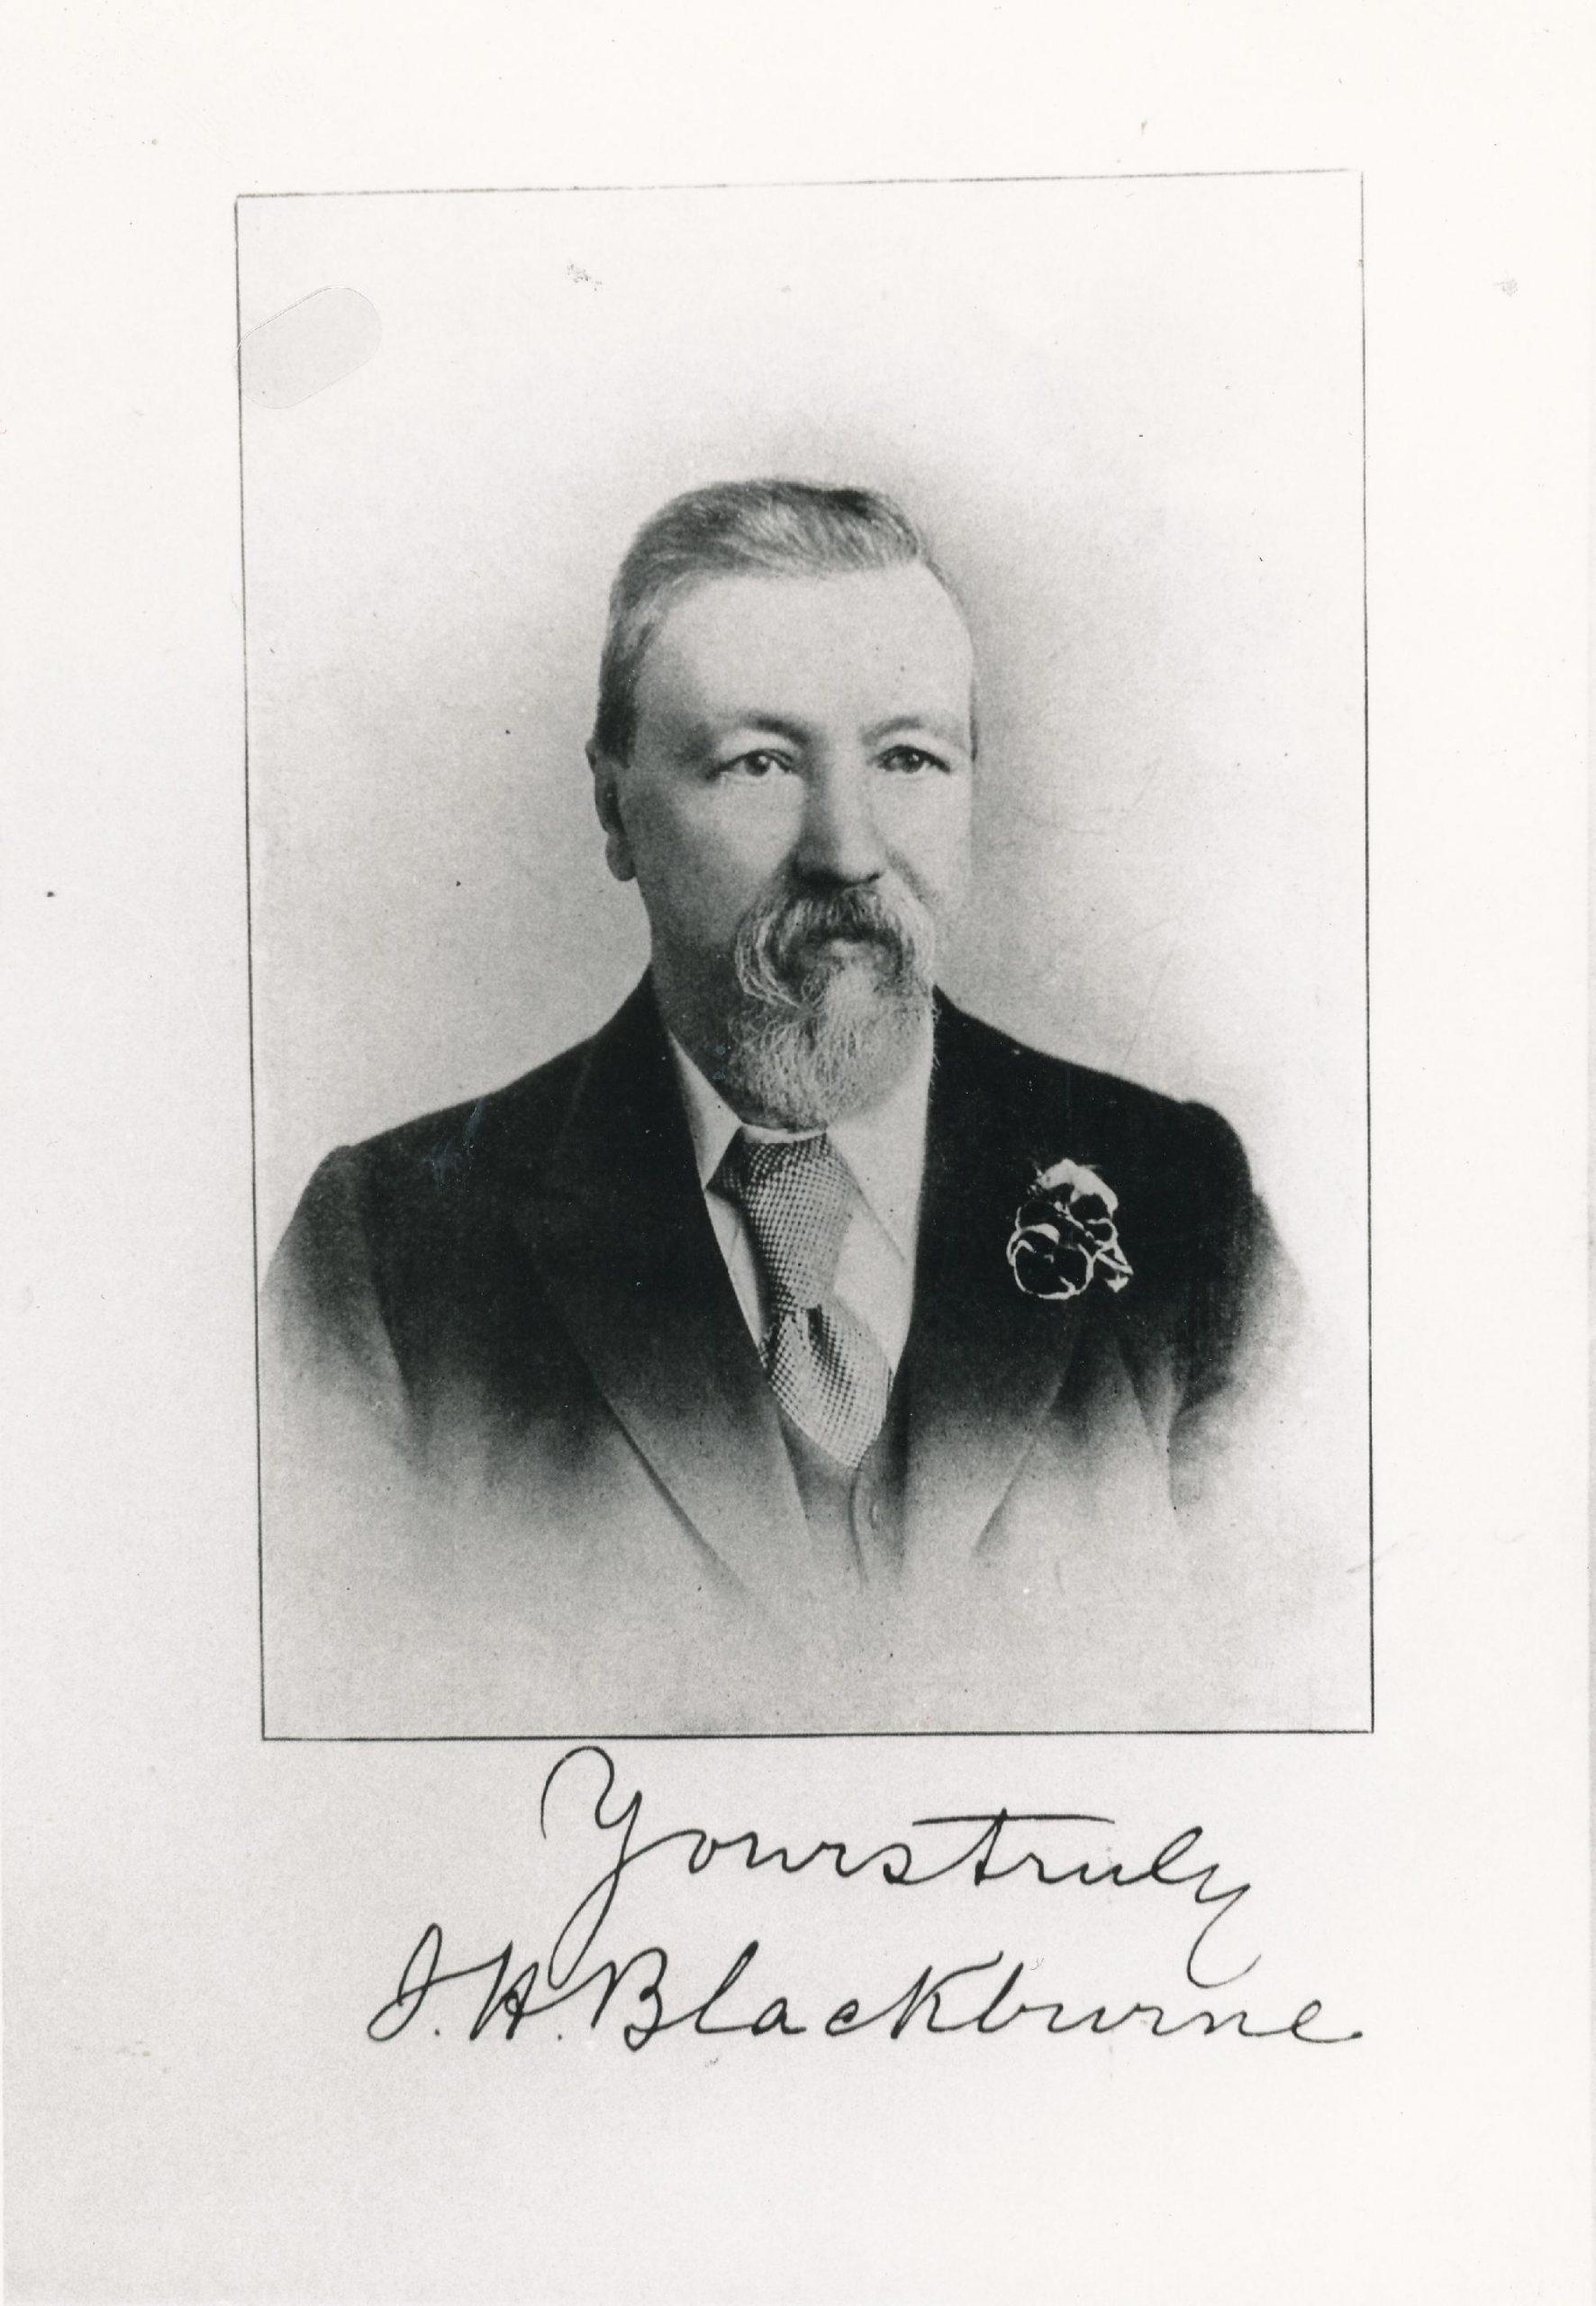 Joseph Henry Blackburne (10-xii-1841 01-ix-1924)